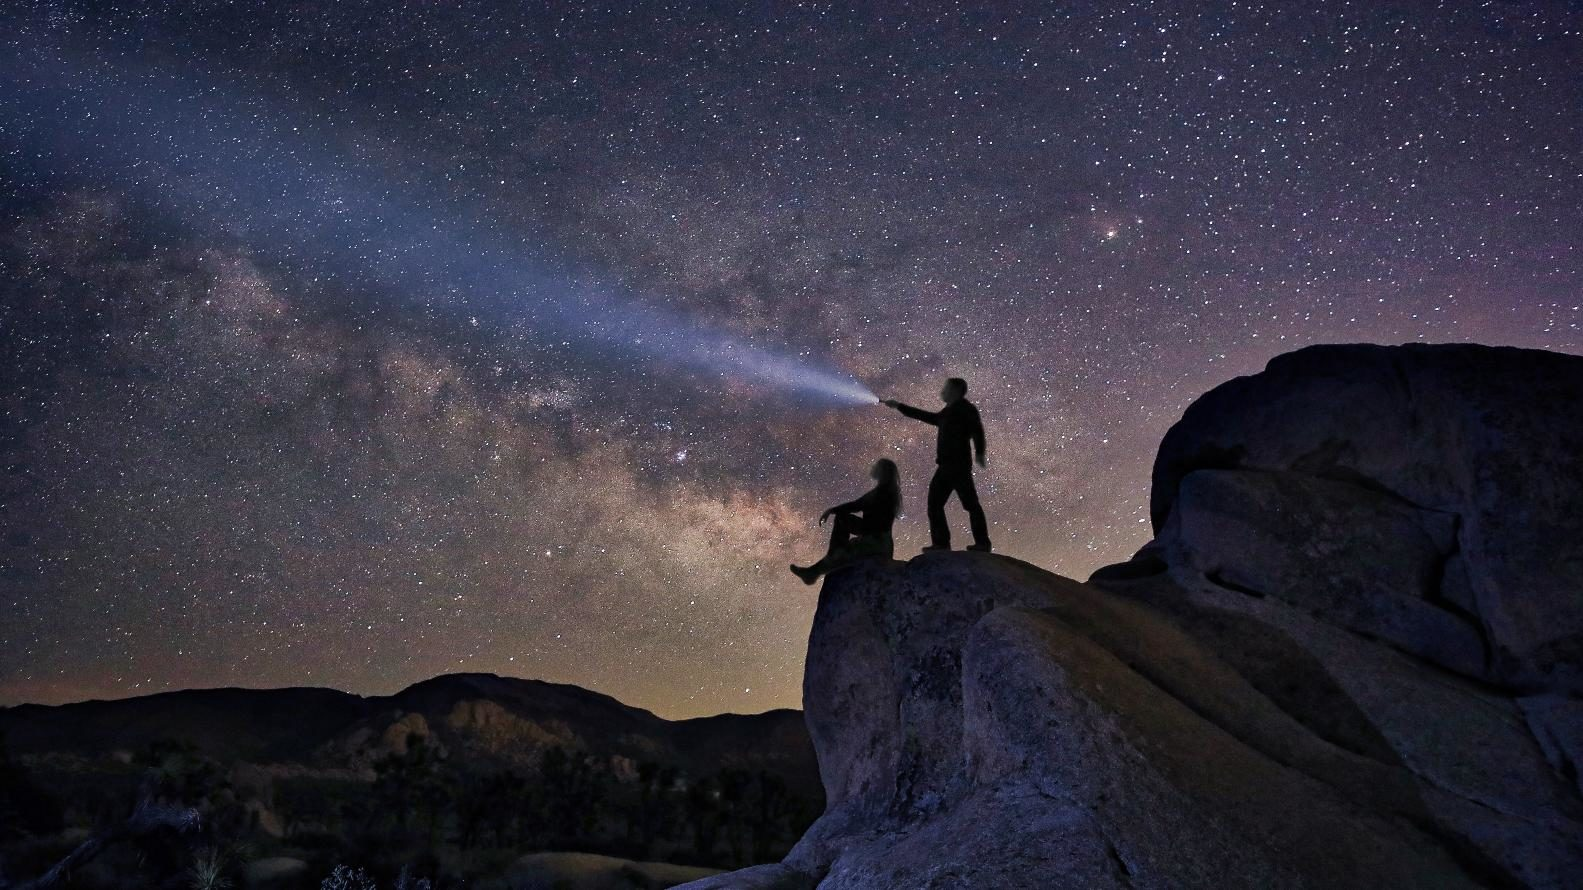 Pareja en Noche estrellada Foto JT ASTK